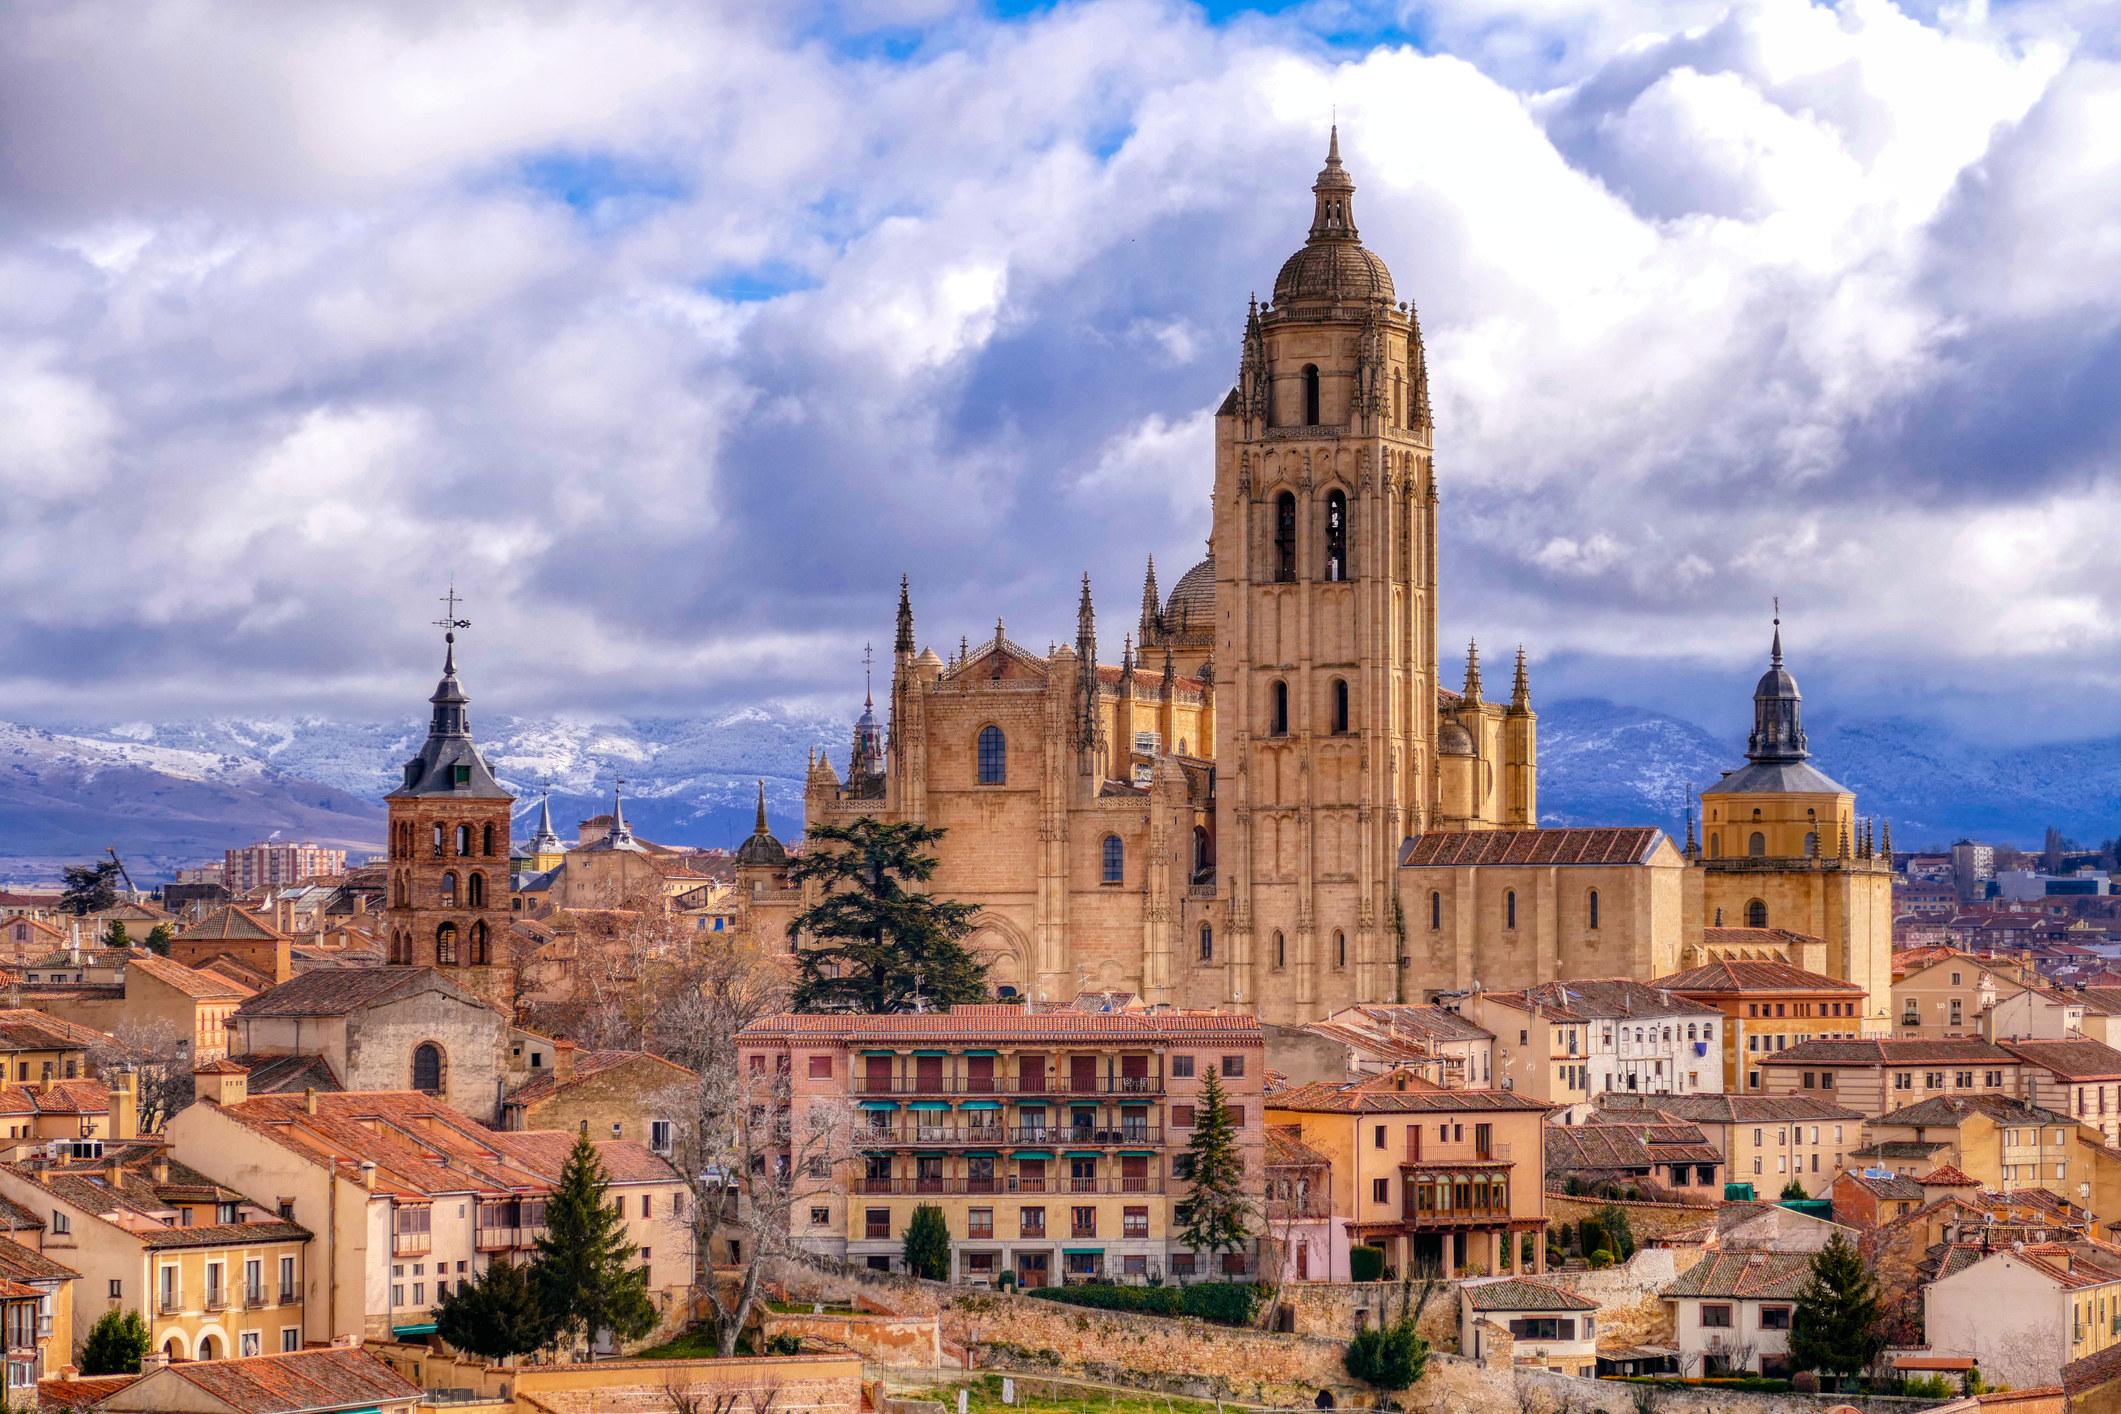 An old castle in Segovia.